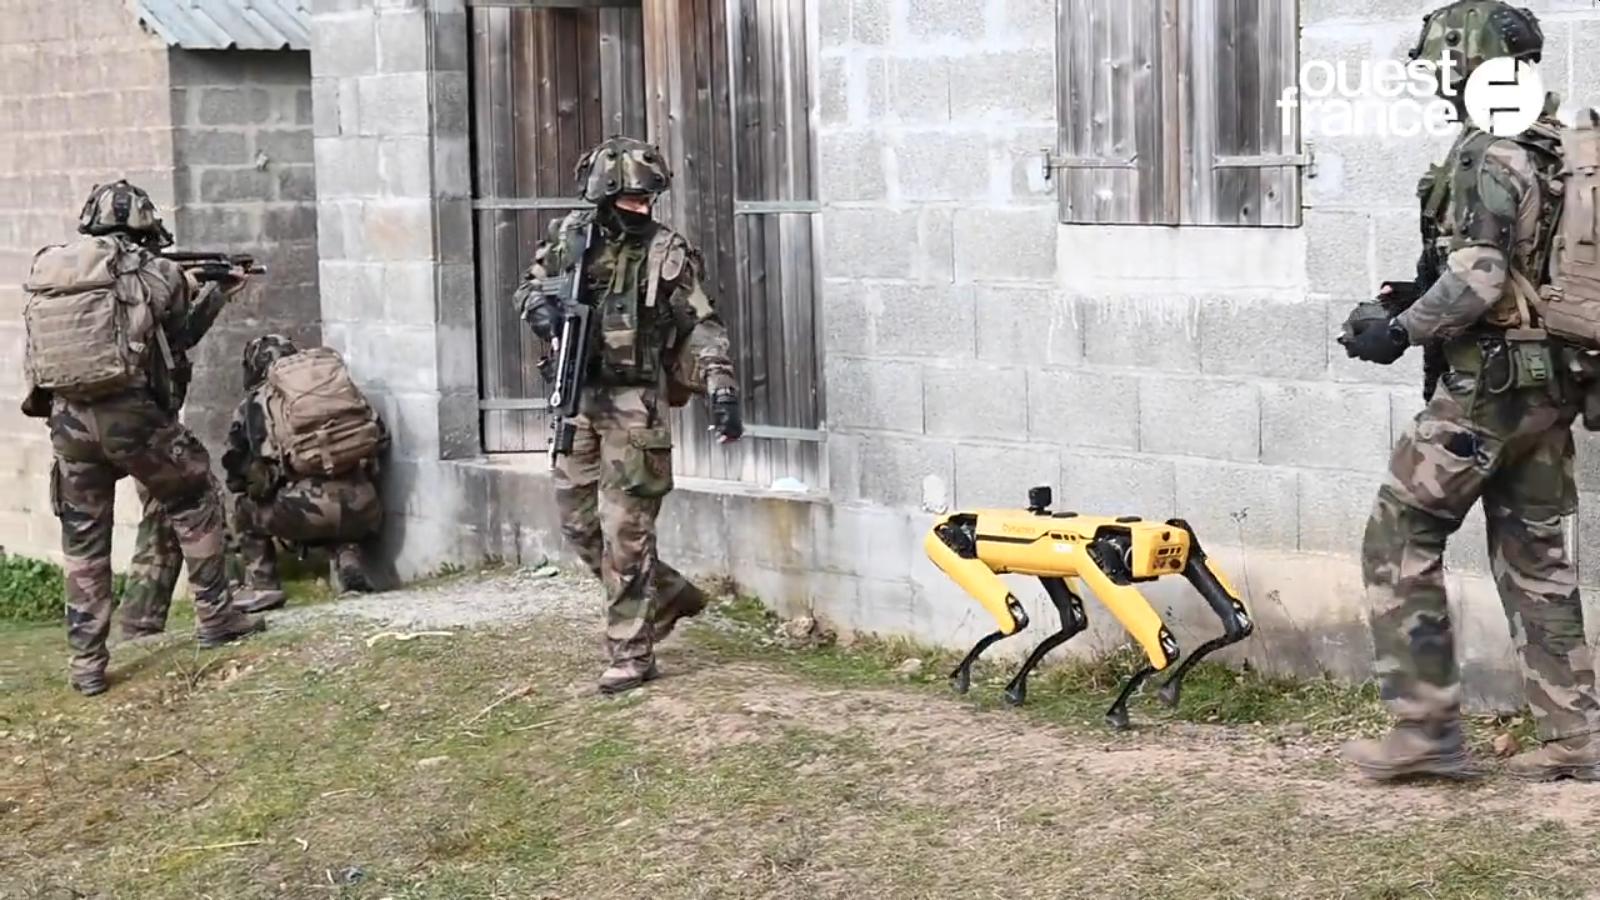 Frankreichs Militär testet Roboter im Häuserkampf